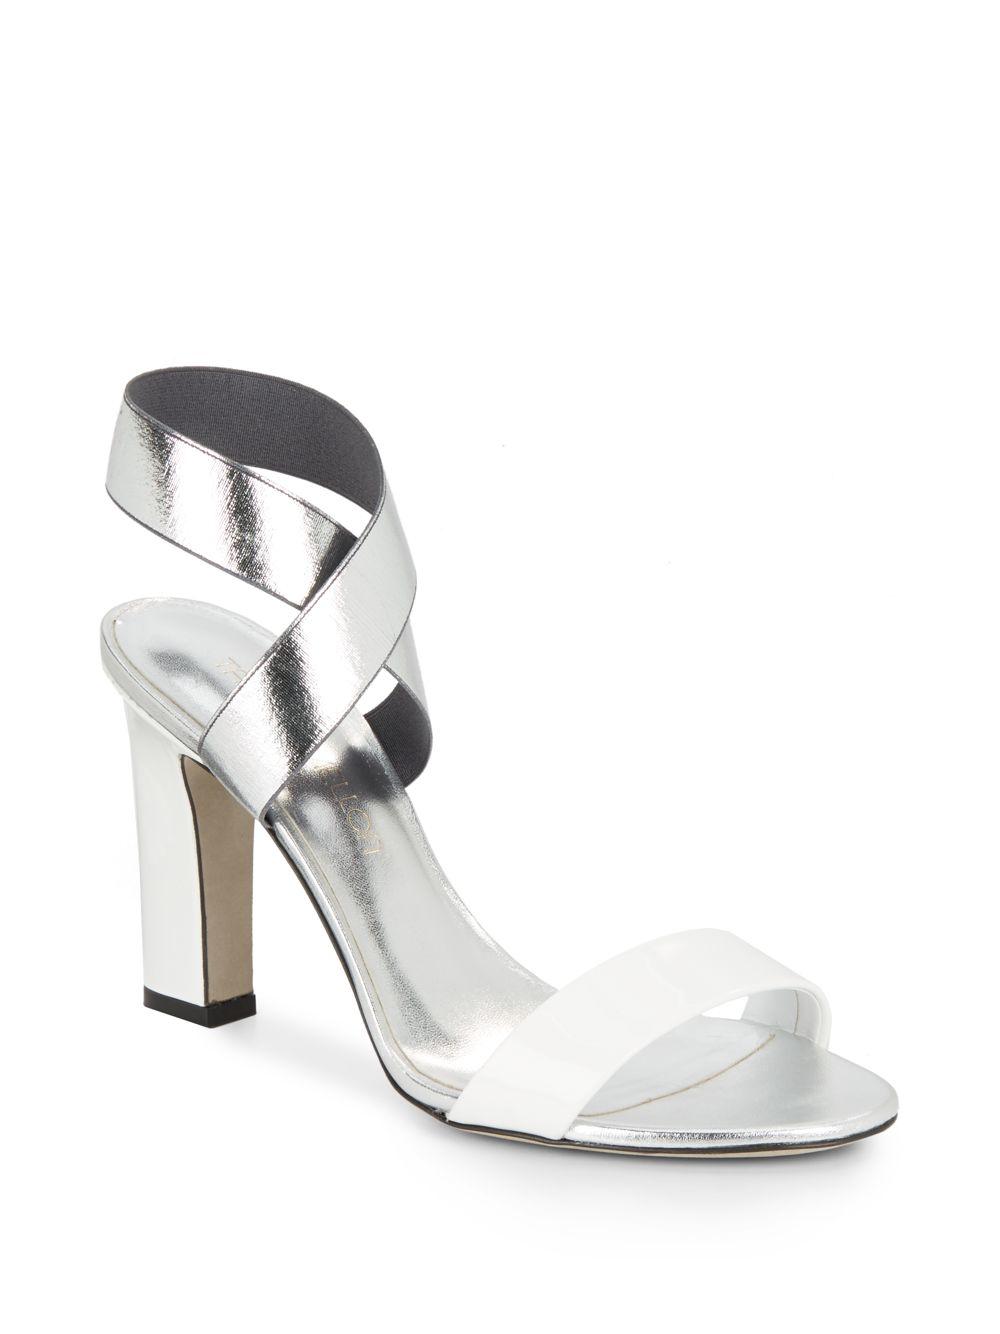 Lyst Tamara Mellon Feel Metallic Colorblock Sandals In White